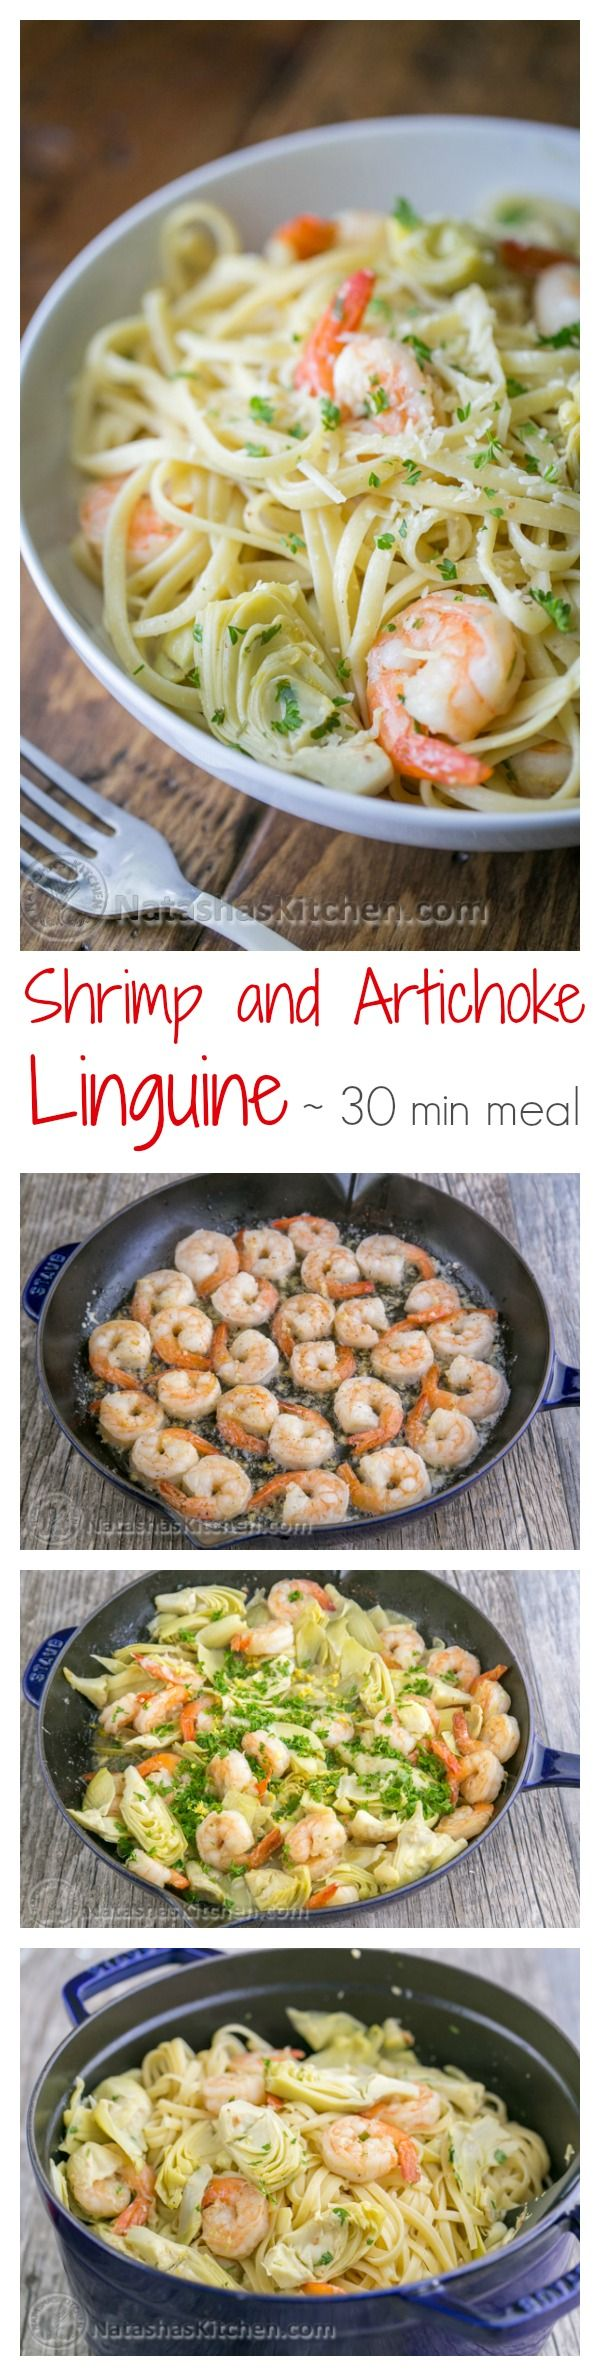 This shrimp and artichoke linguine pasta is a 30-minute meal! It has a fresh and light lemon herb sauce - DELICIOUS!! | natashaskitchen.com